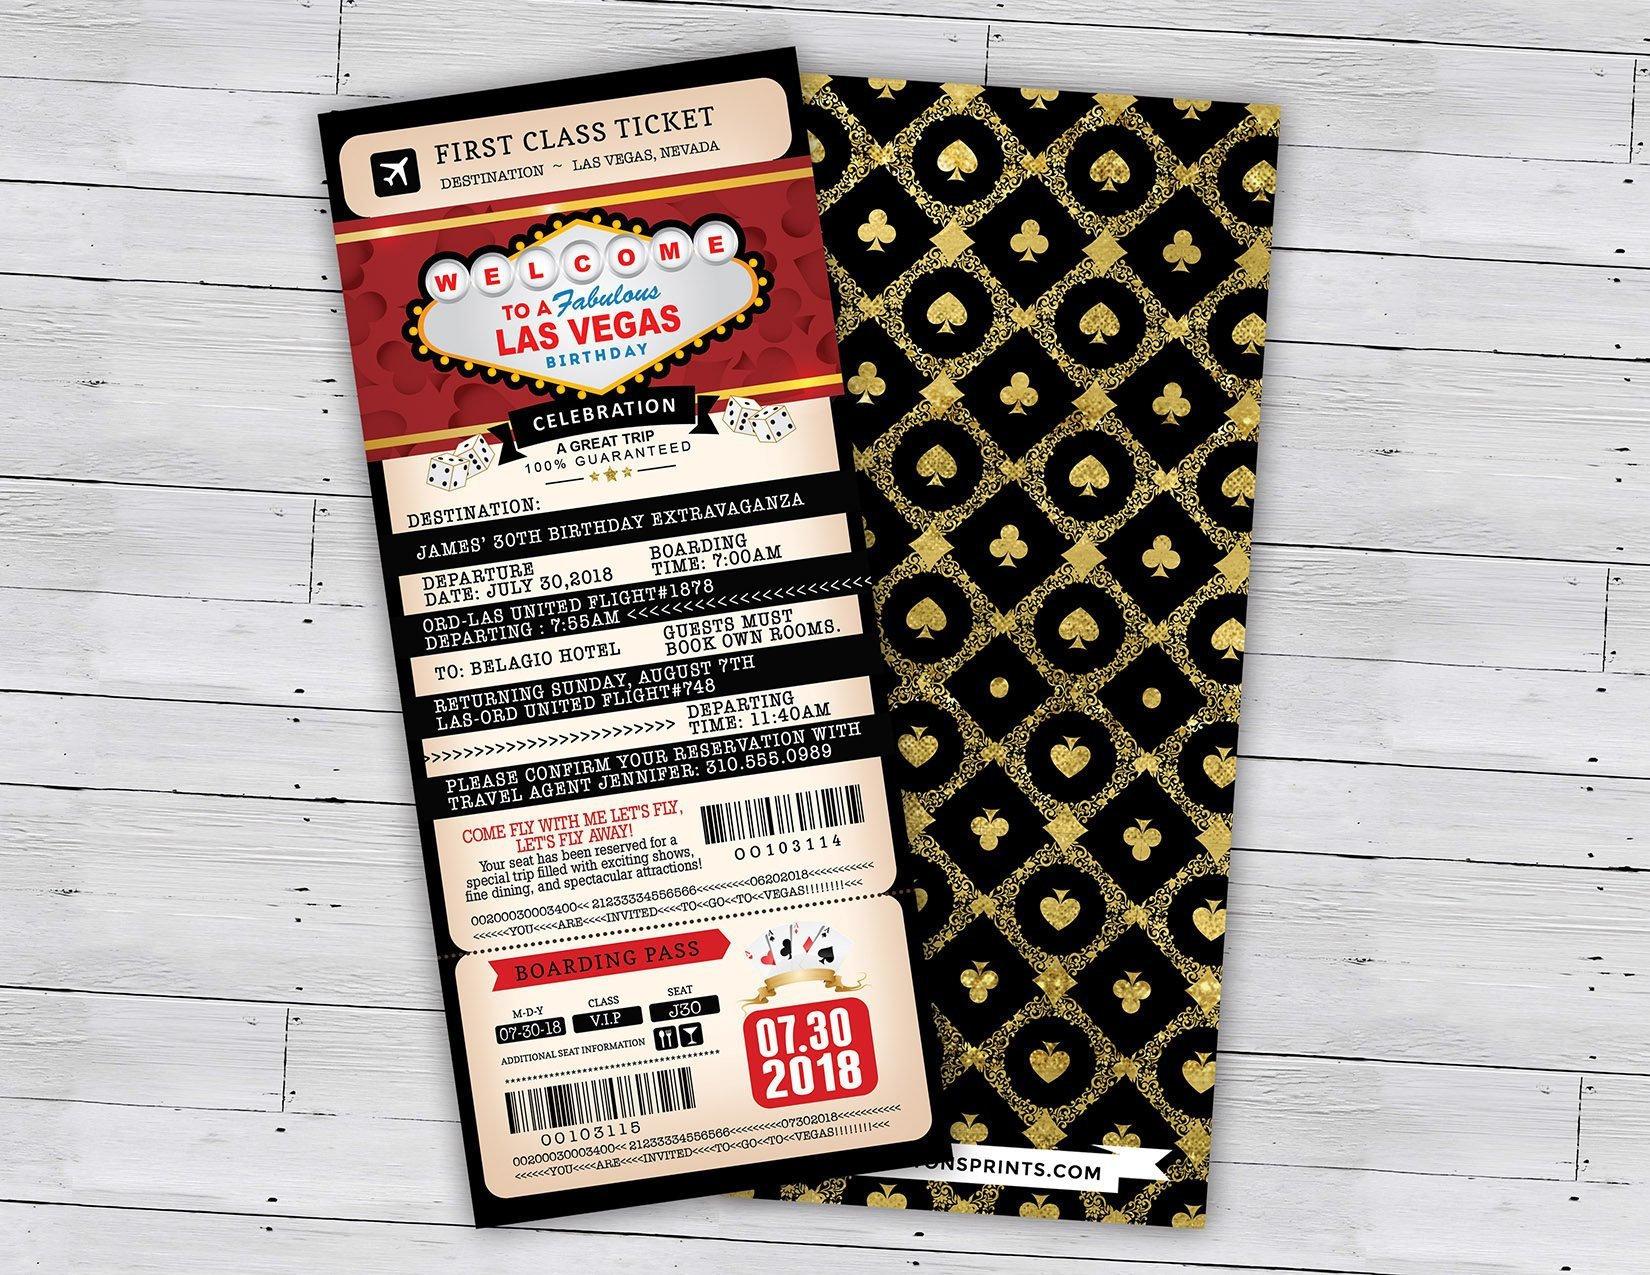 Las Vegas birthday party, PASSPORT and TICKET birthday invitation, travel  birthday party invitation, Vegas, Casino, Digital files only